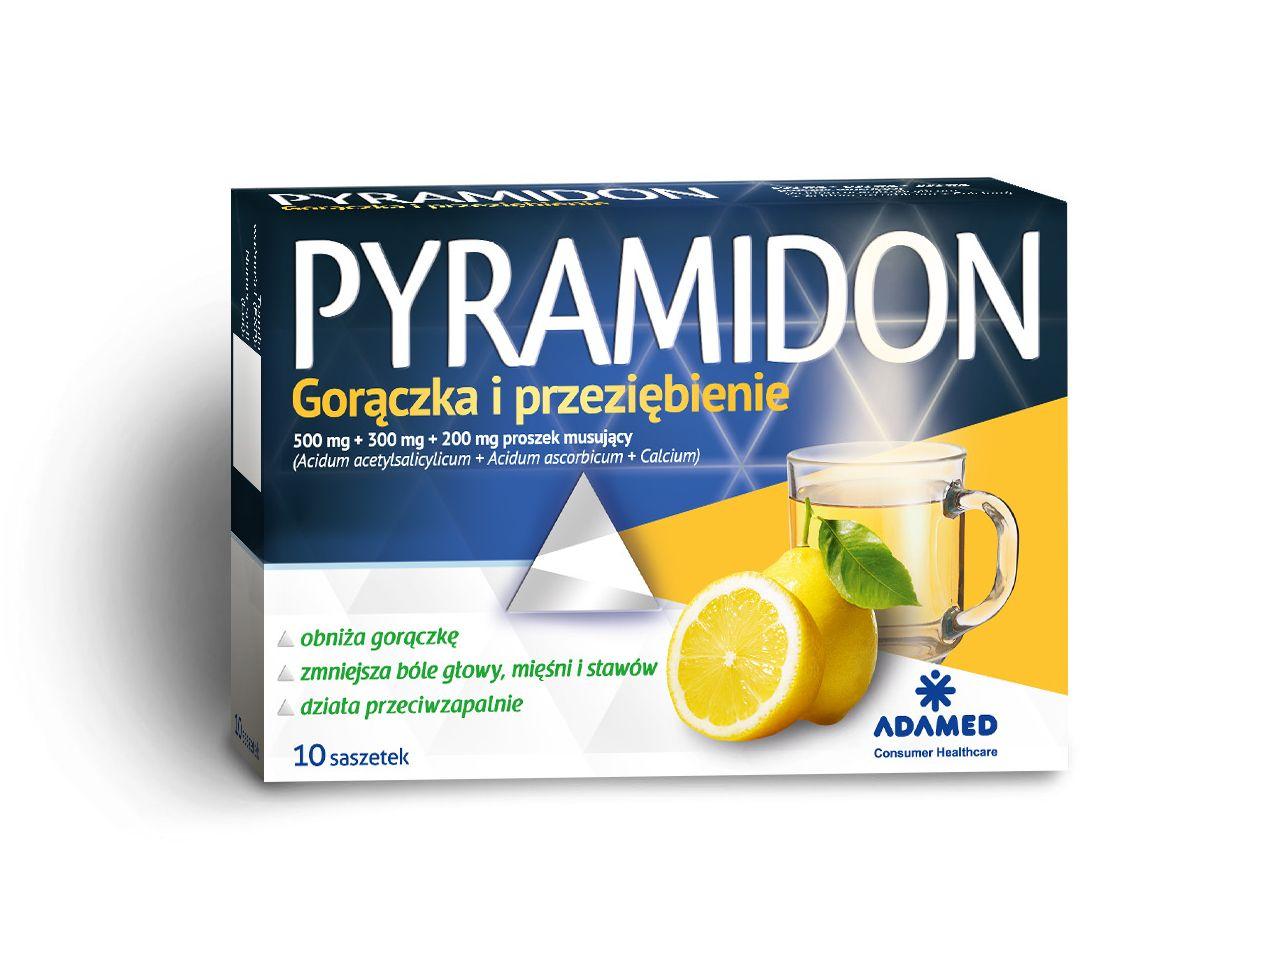 Pyramidon